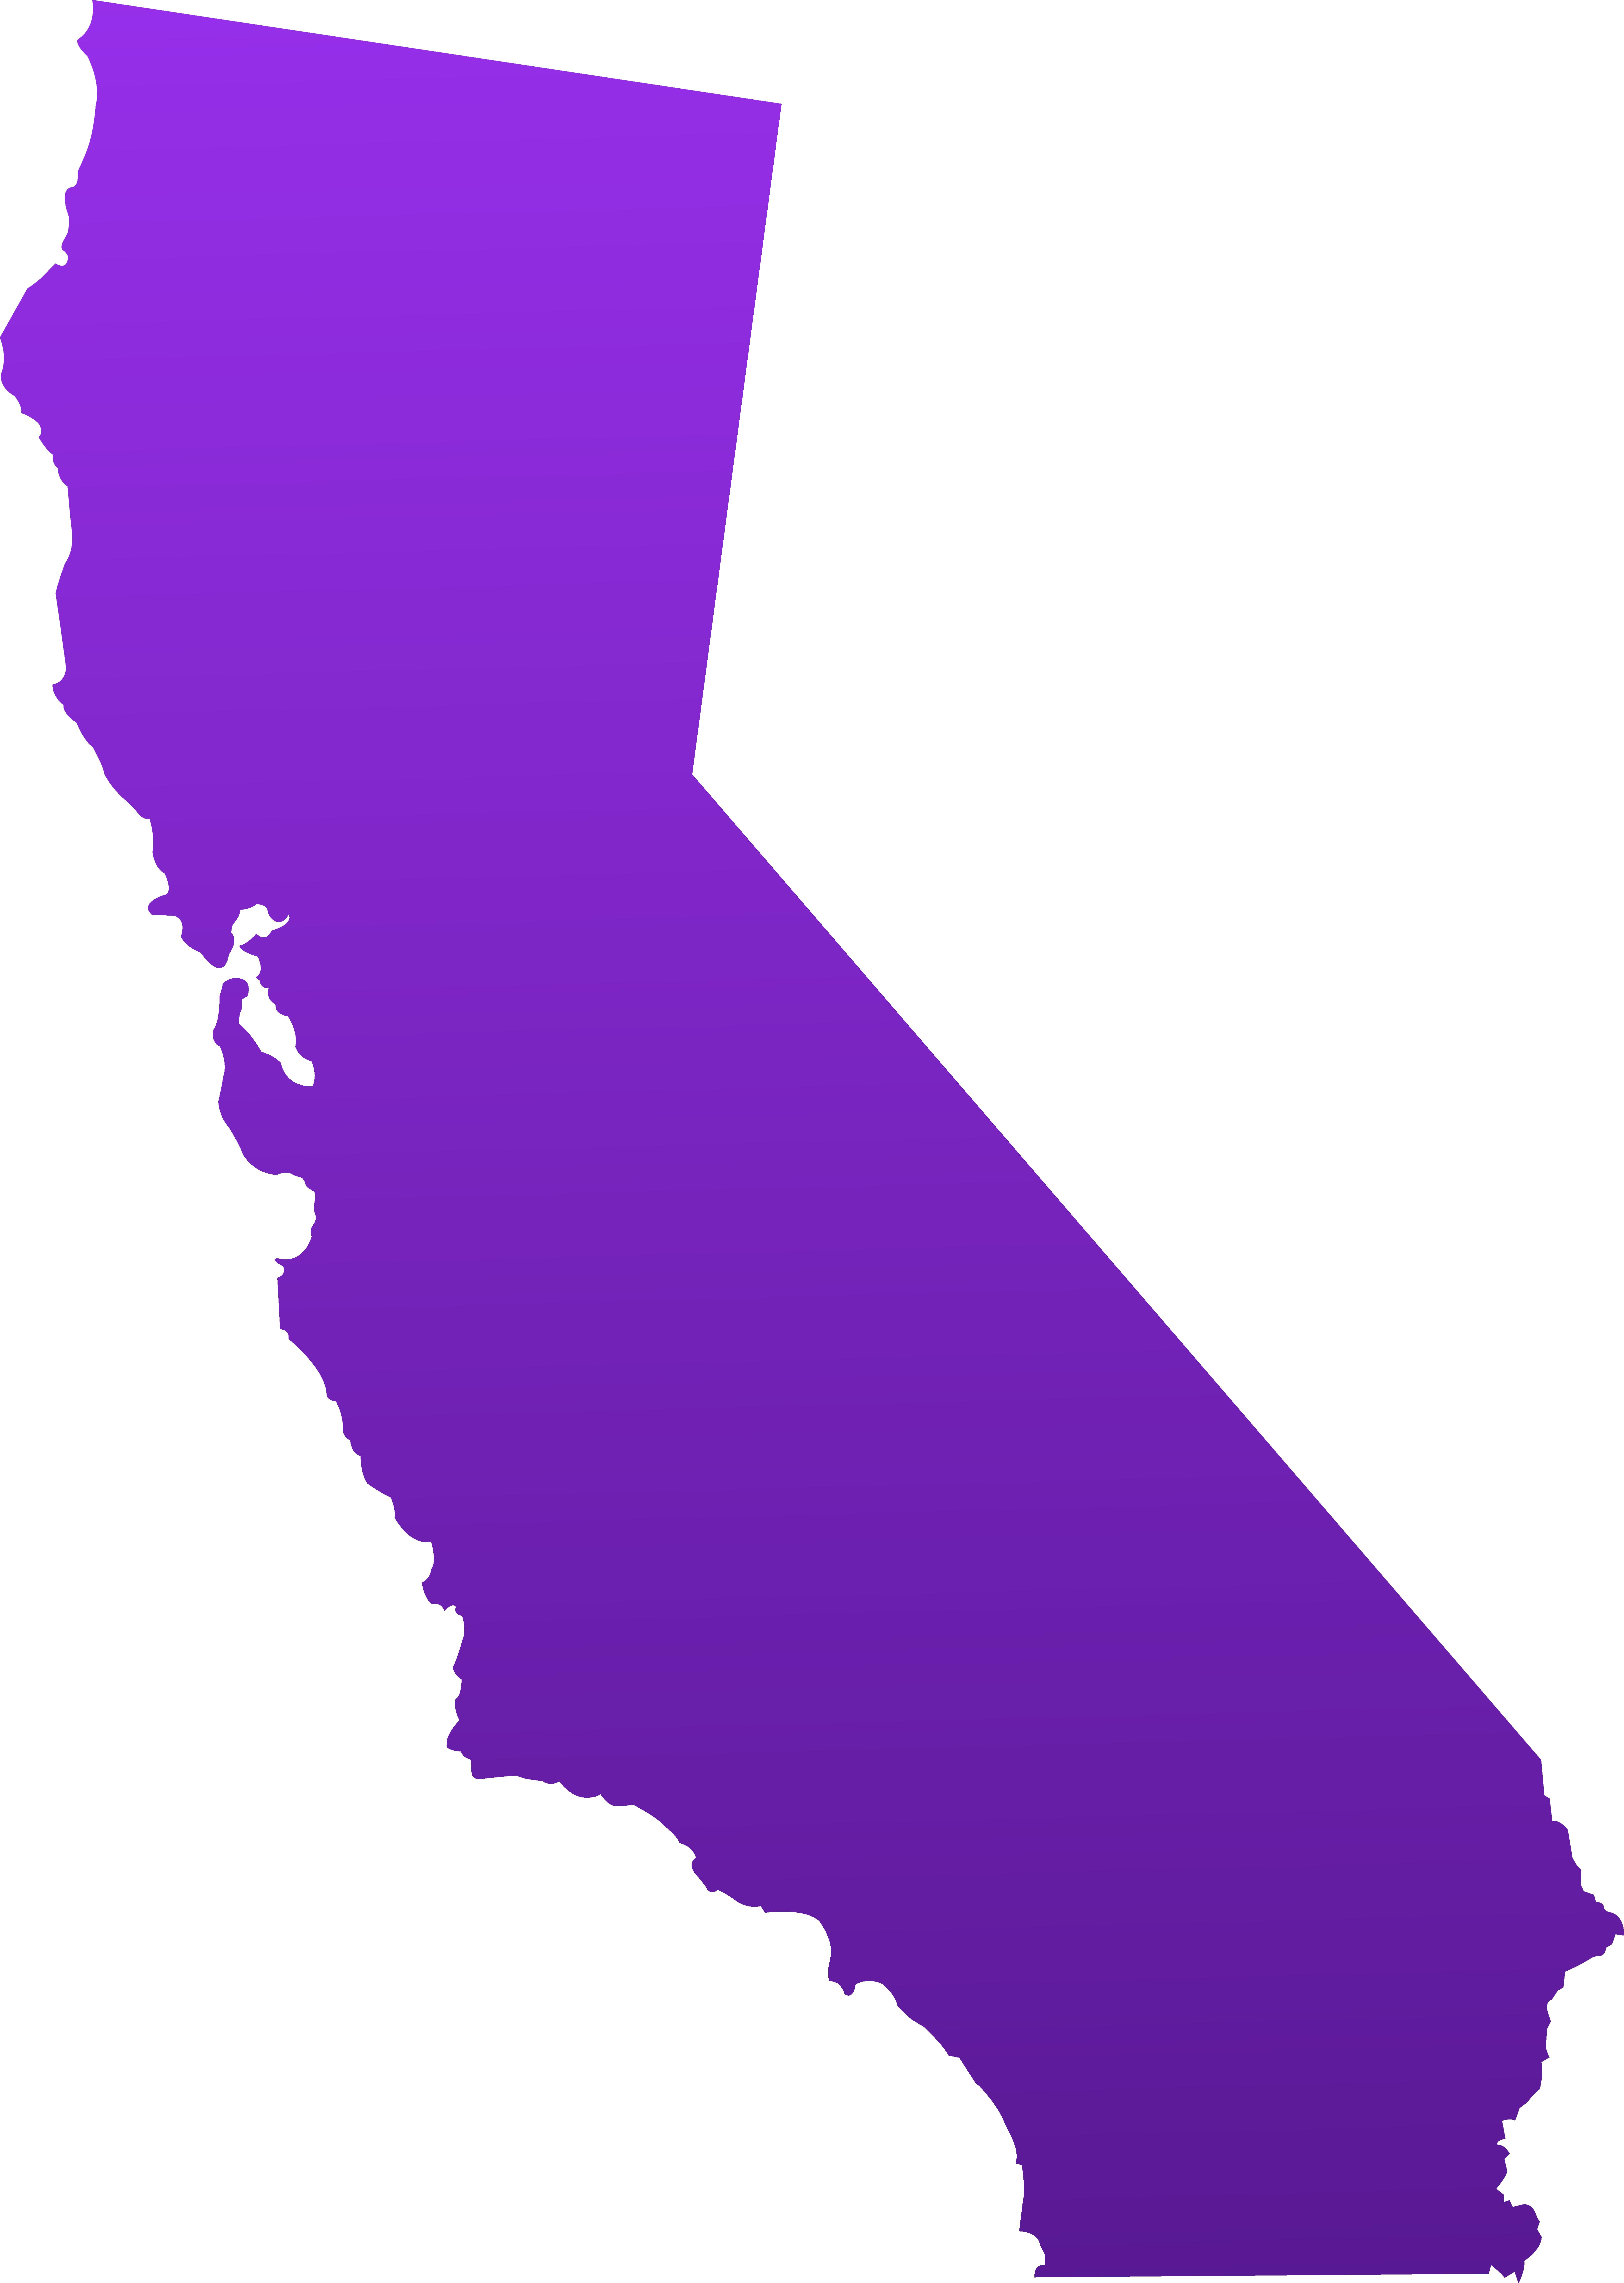 California clipart. Clip art sweet